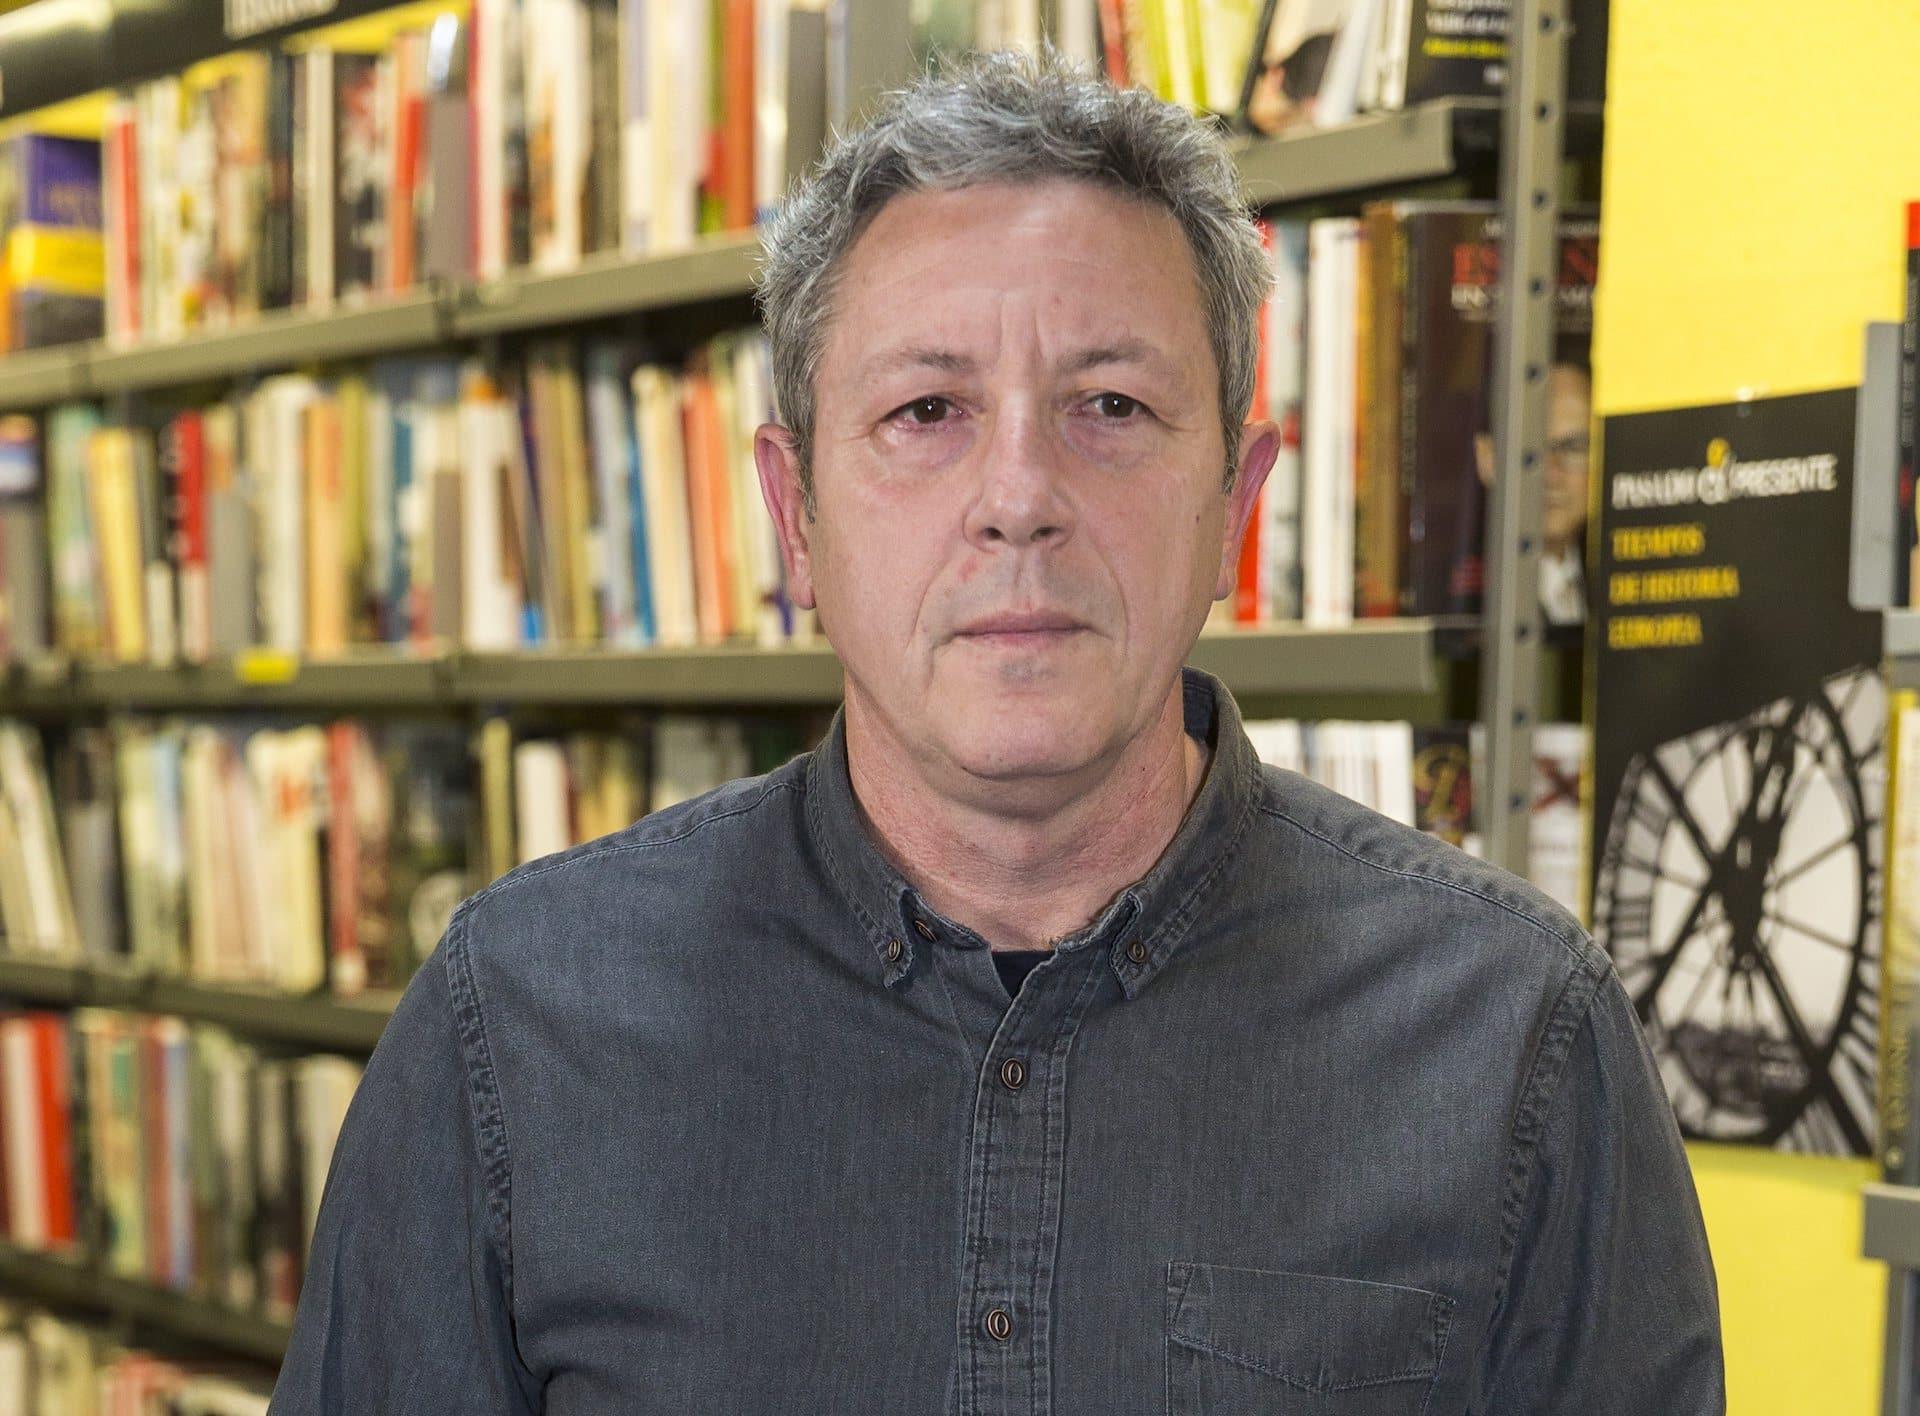 Alonso Guerrero